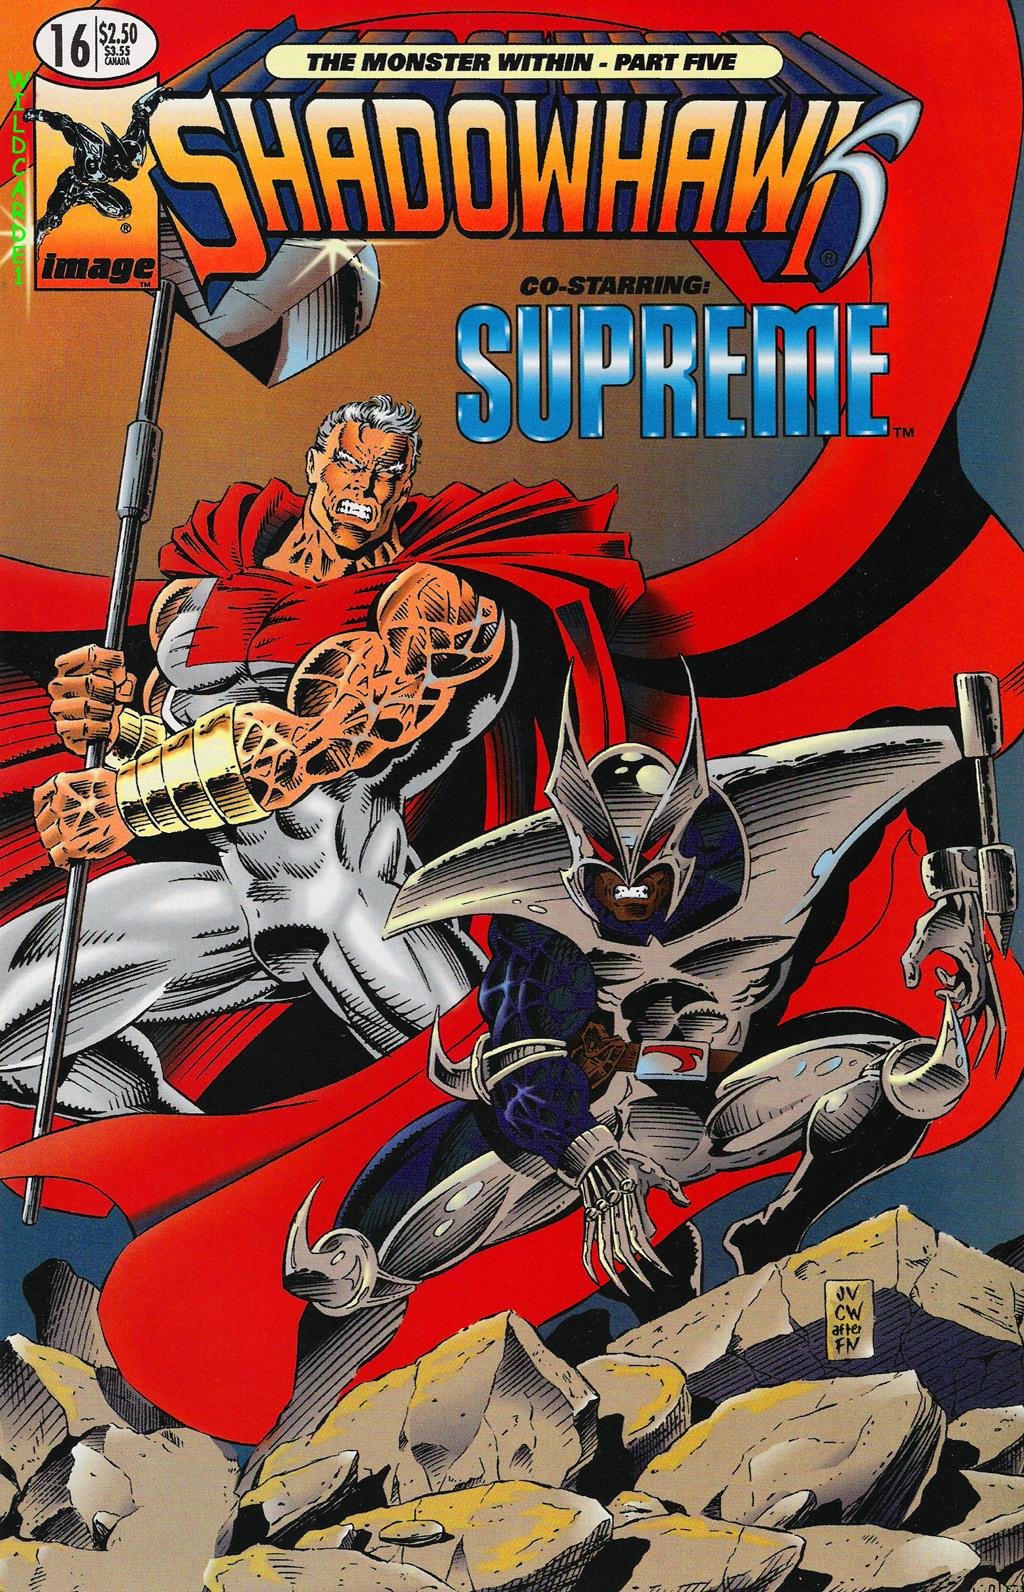 Read online ShadowHawk comic -  Issue #16 - 1